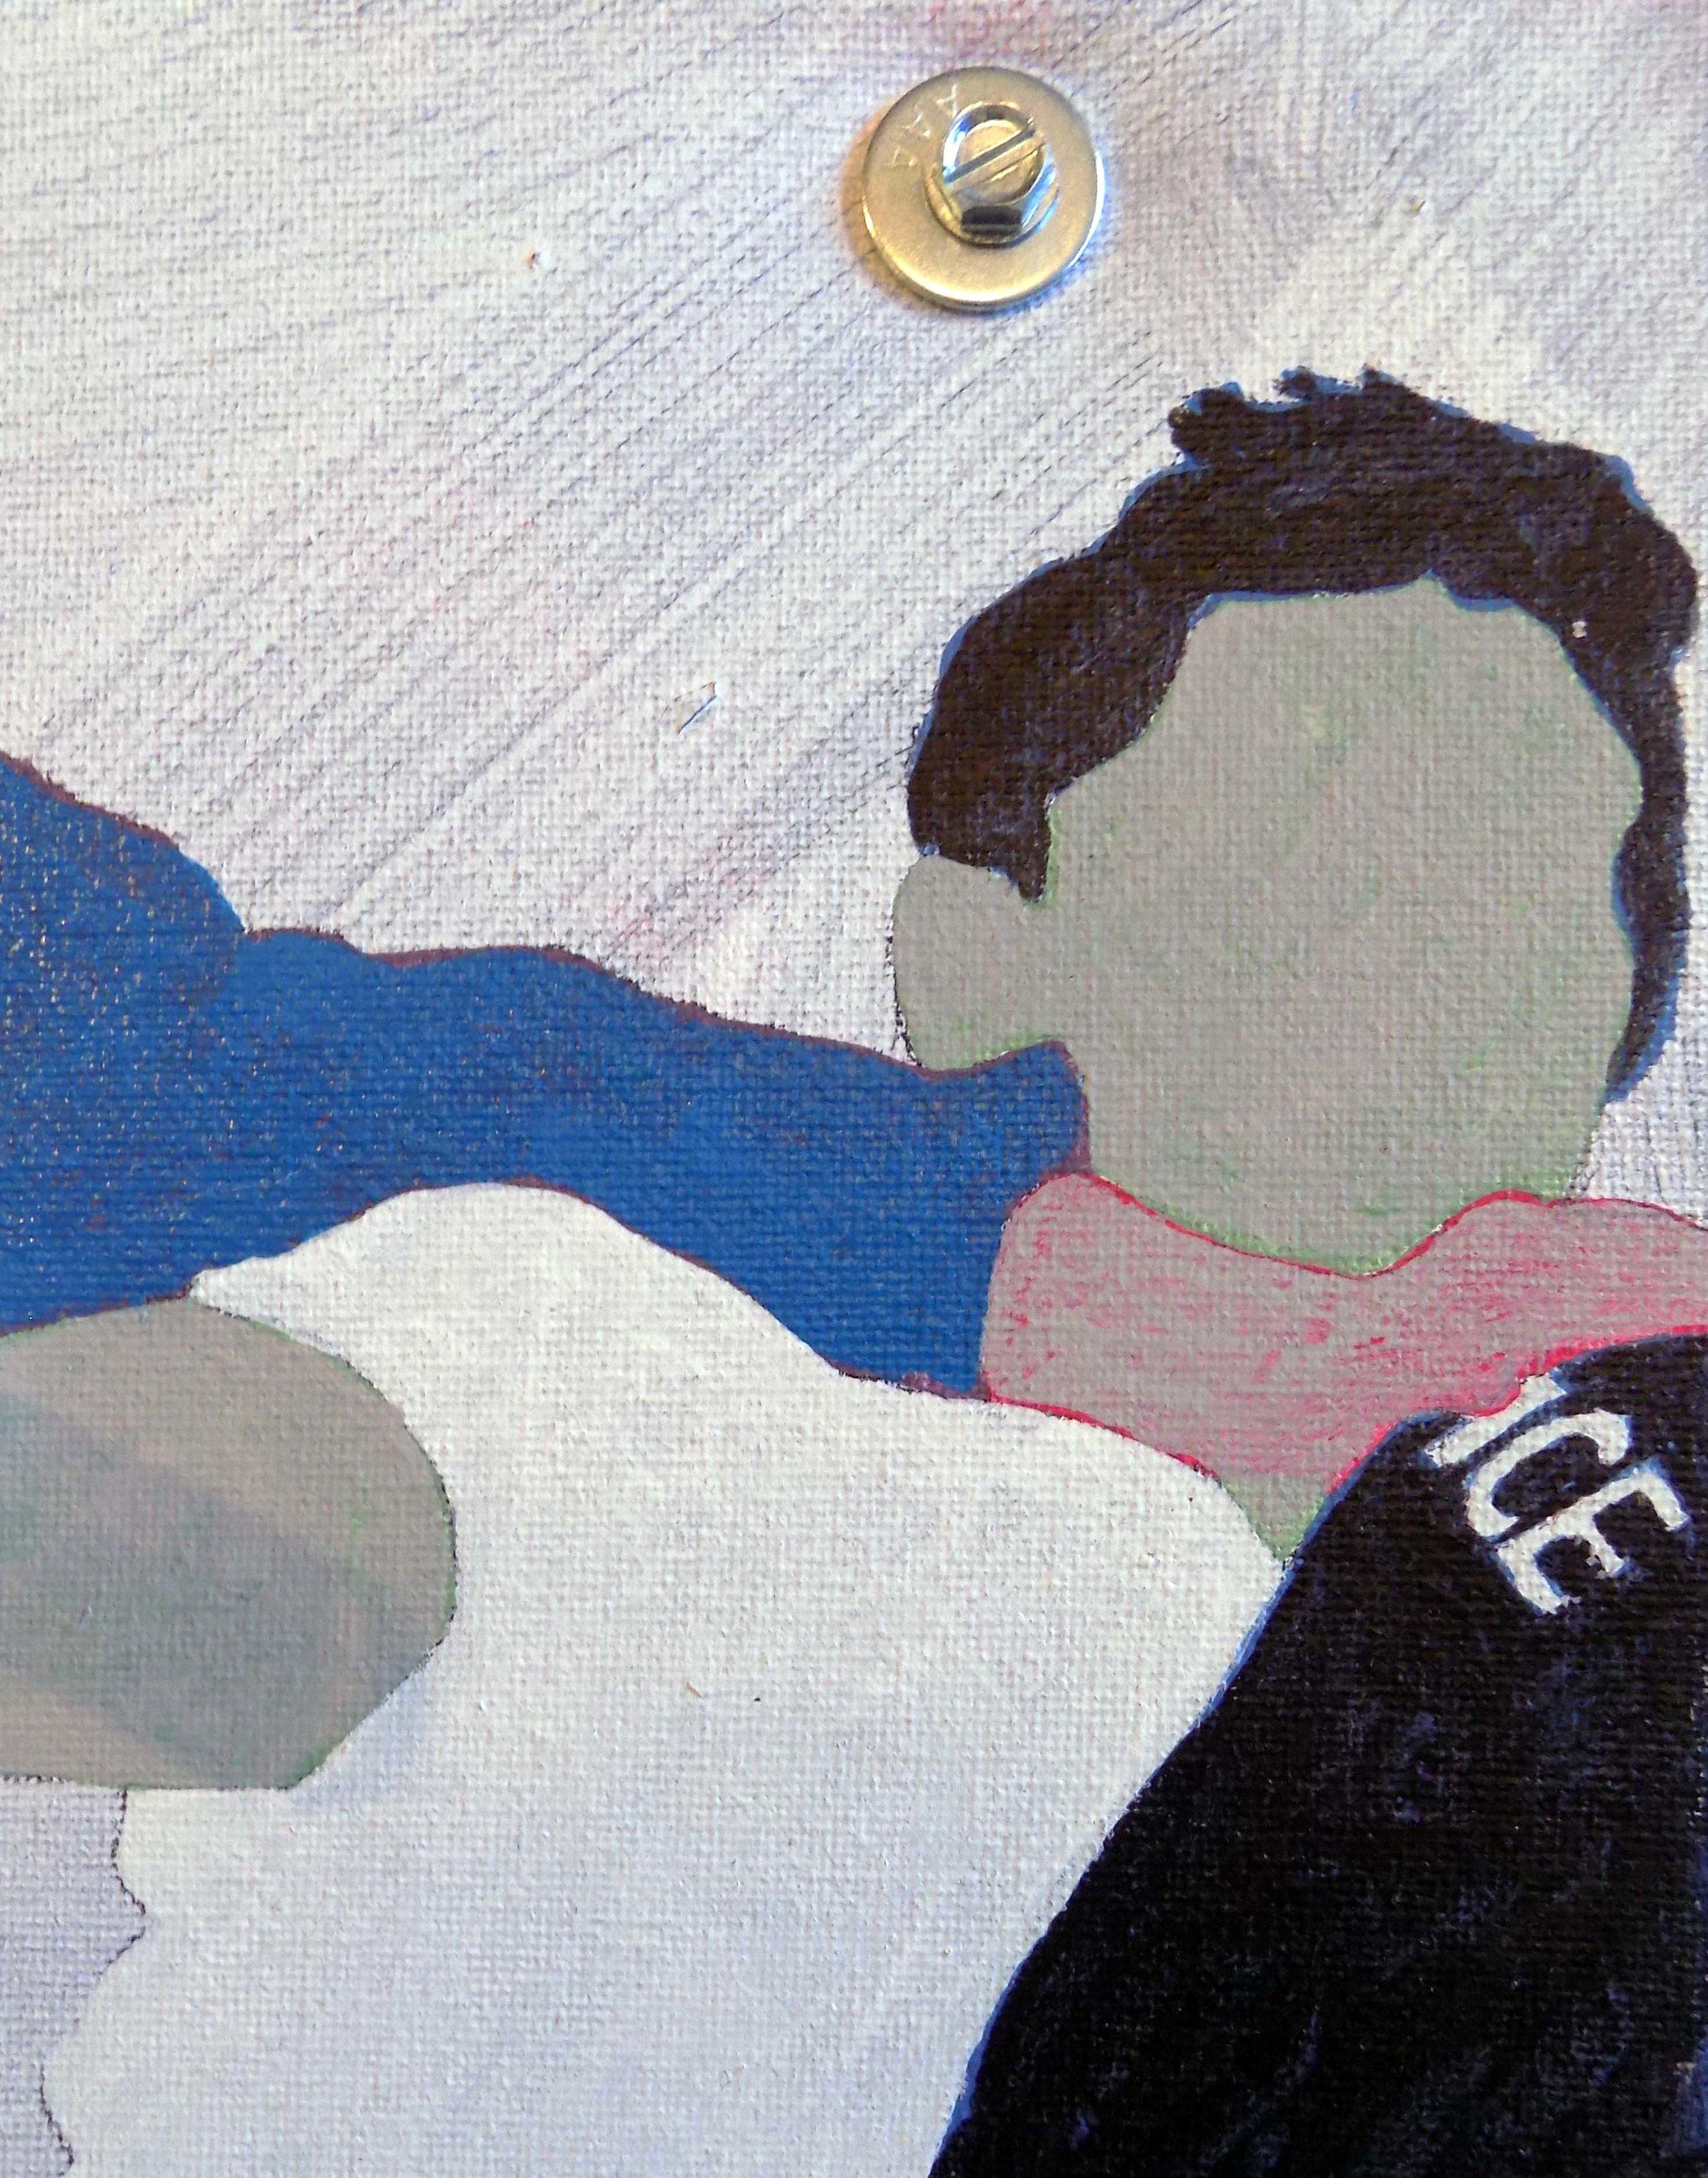 CROWD - STRIFE #3 - DETAIL